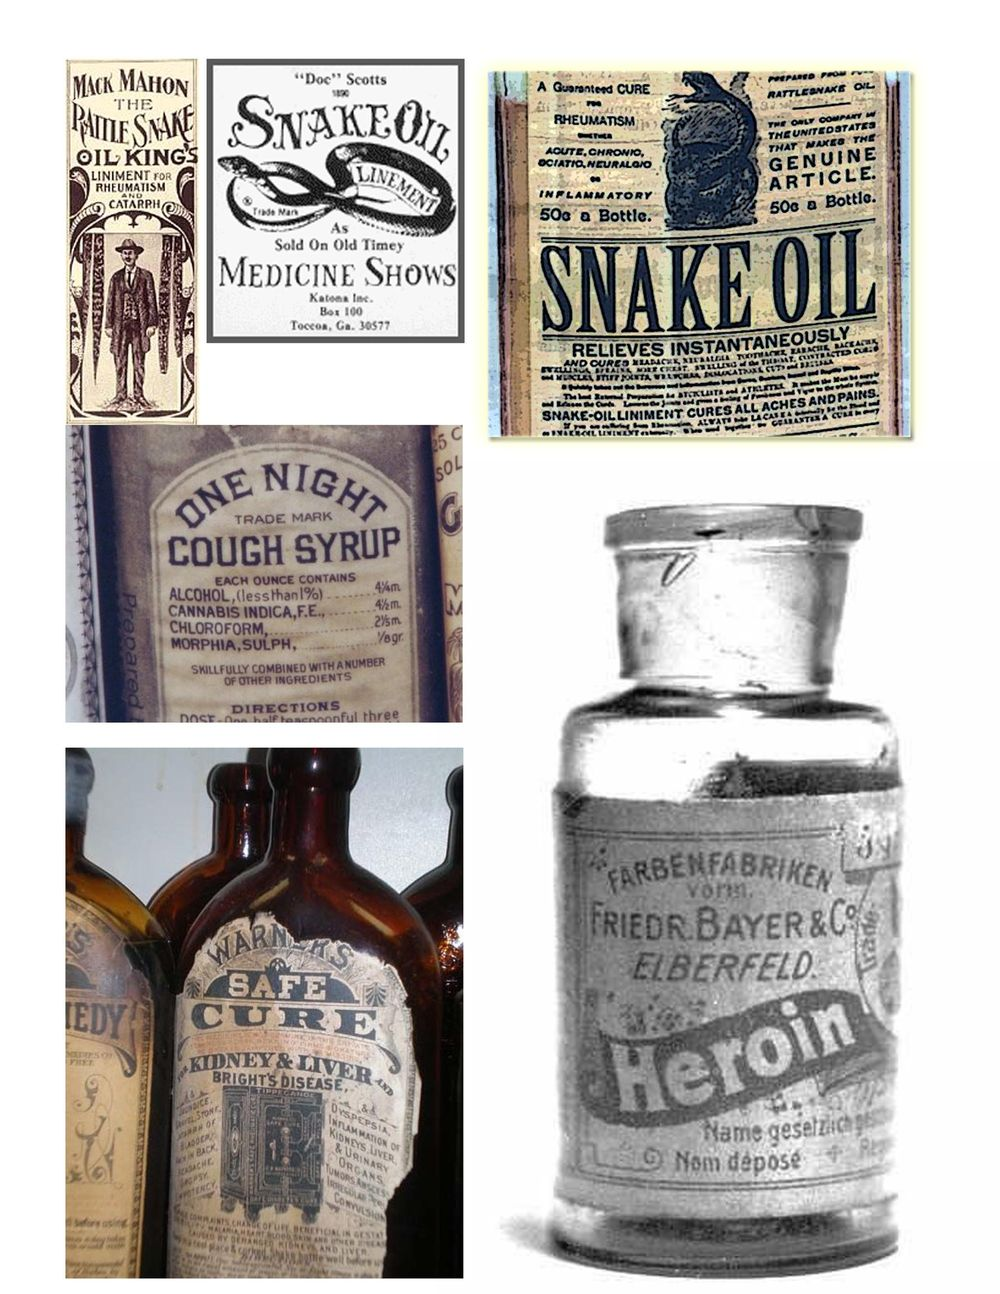 Snake Oil - Mercury Tonic - image 2 - student project